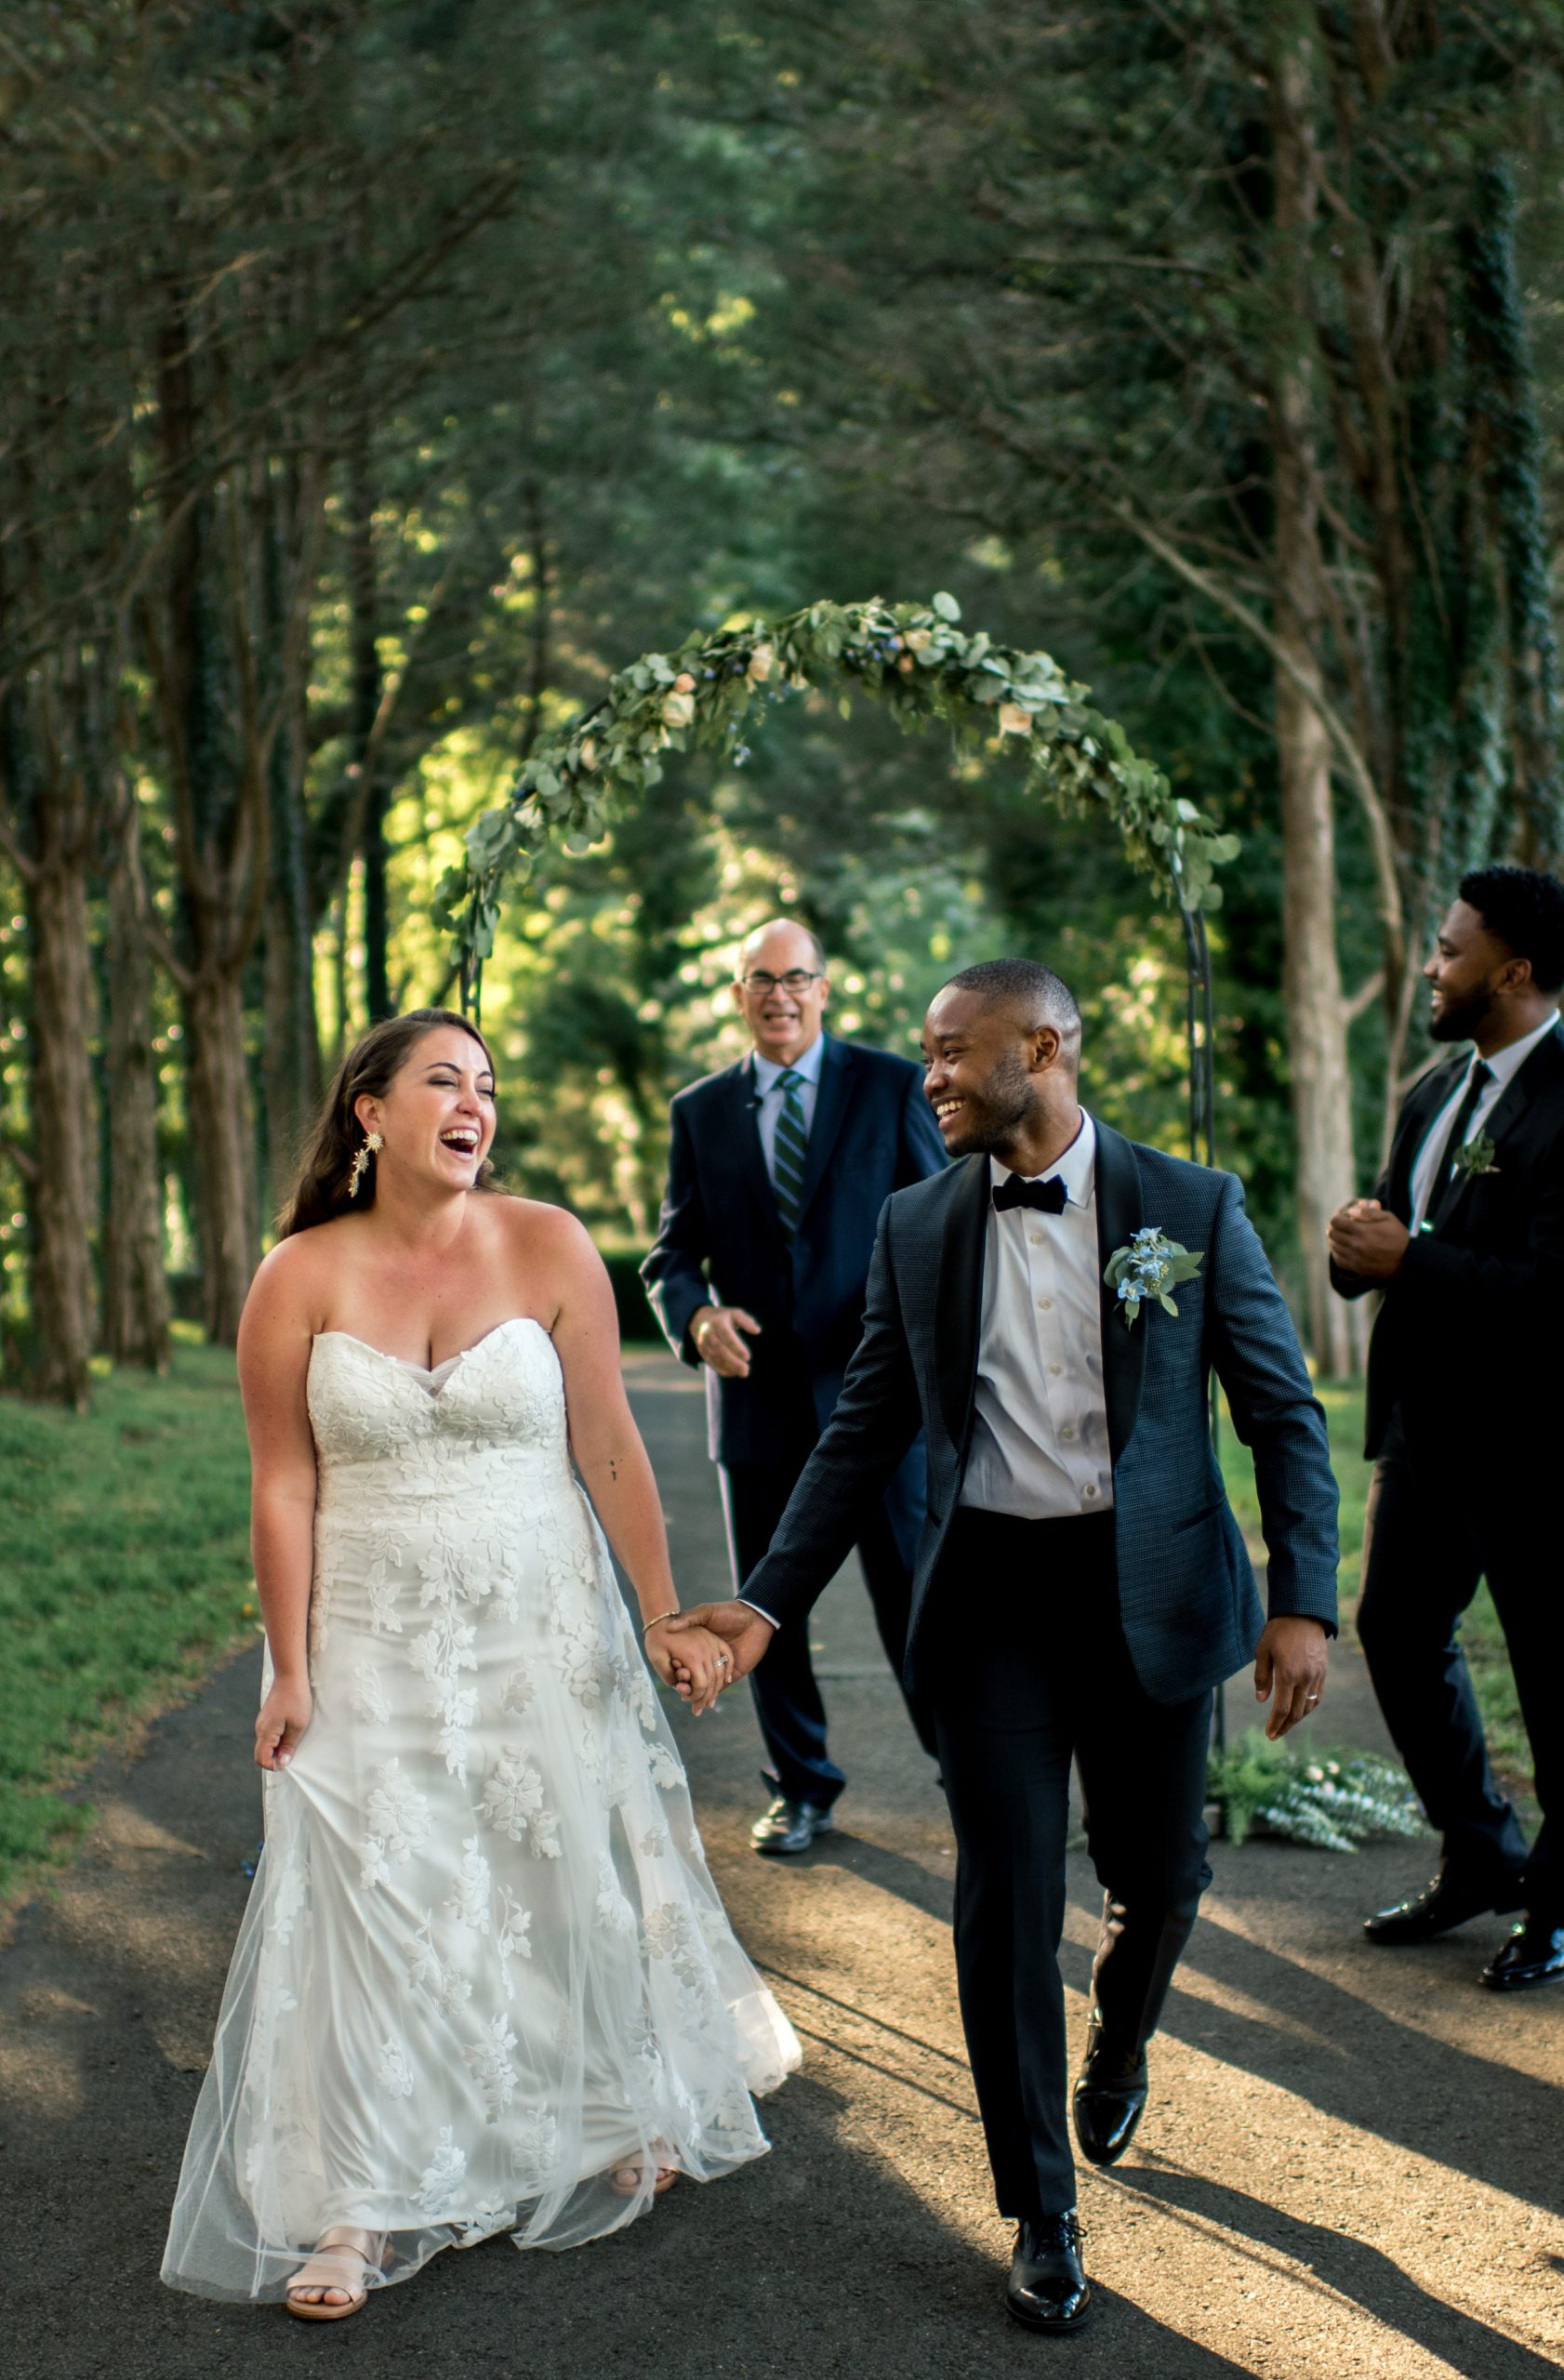 joyful candid wedding moment in virginia